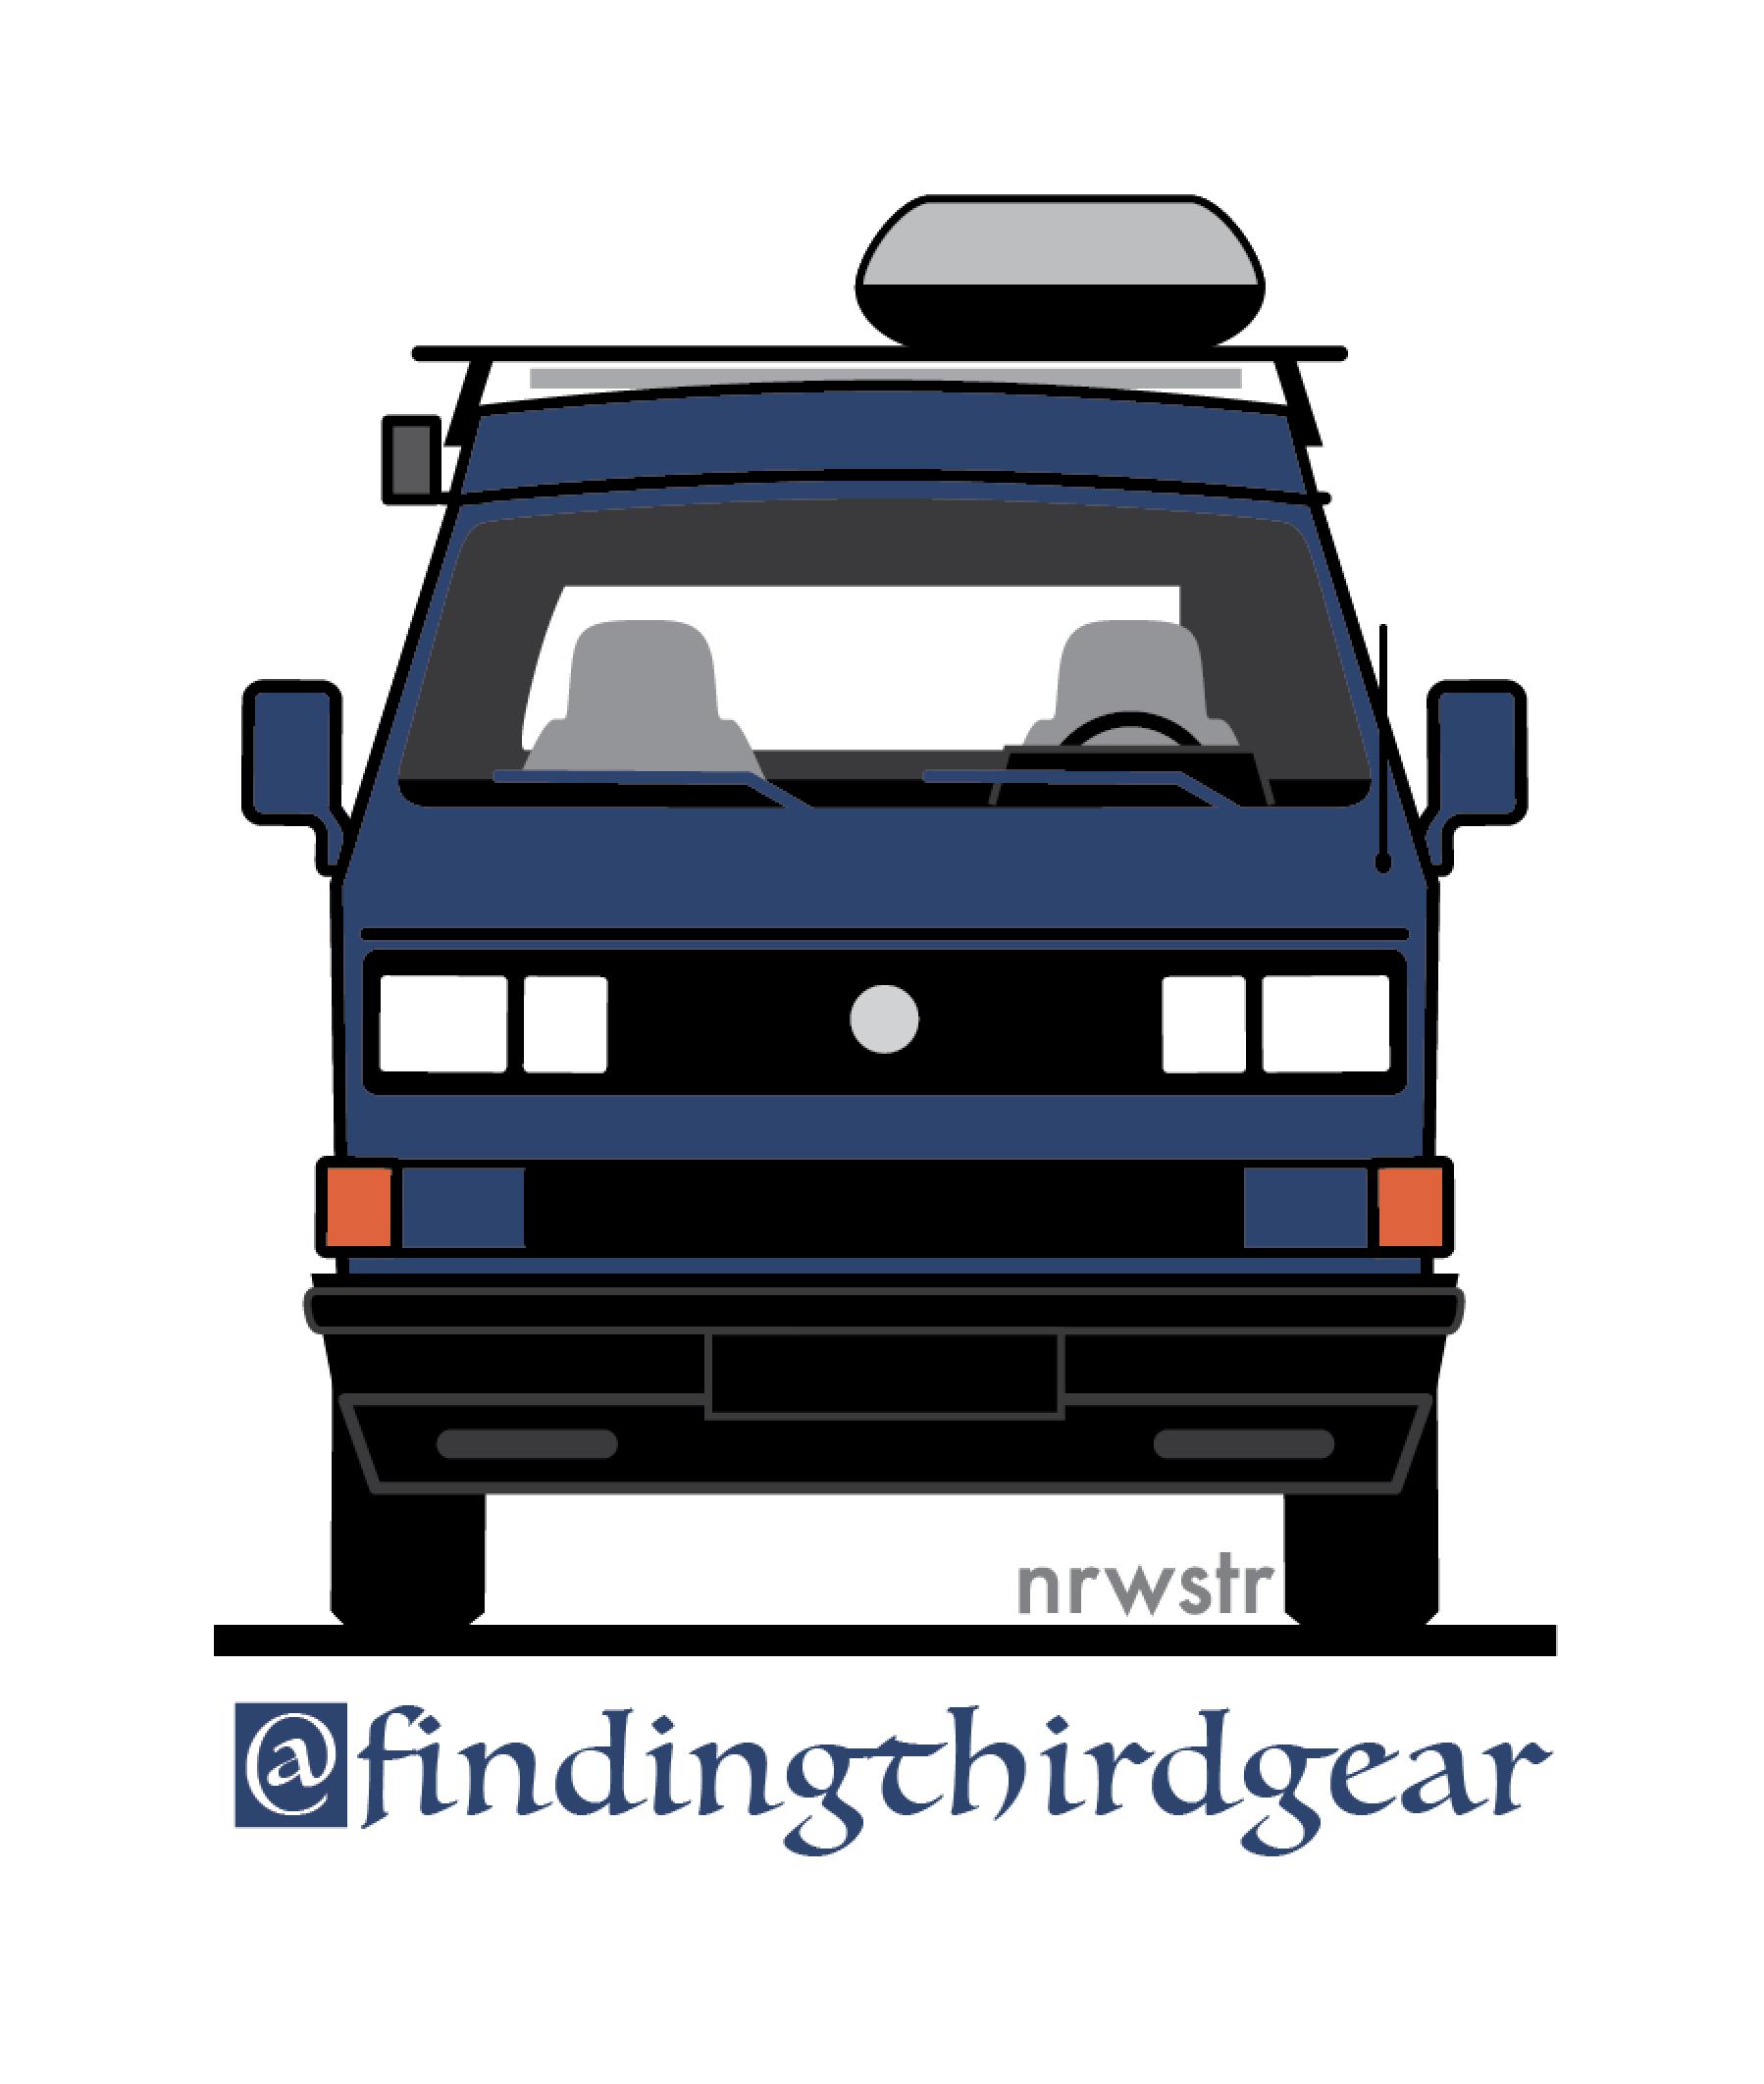 comm-findingthirdgear front view.png